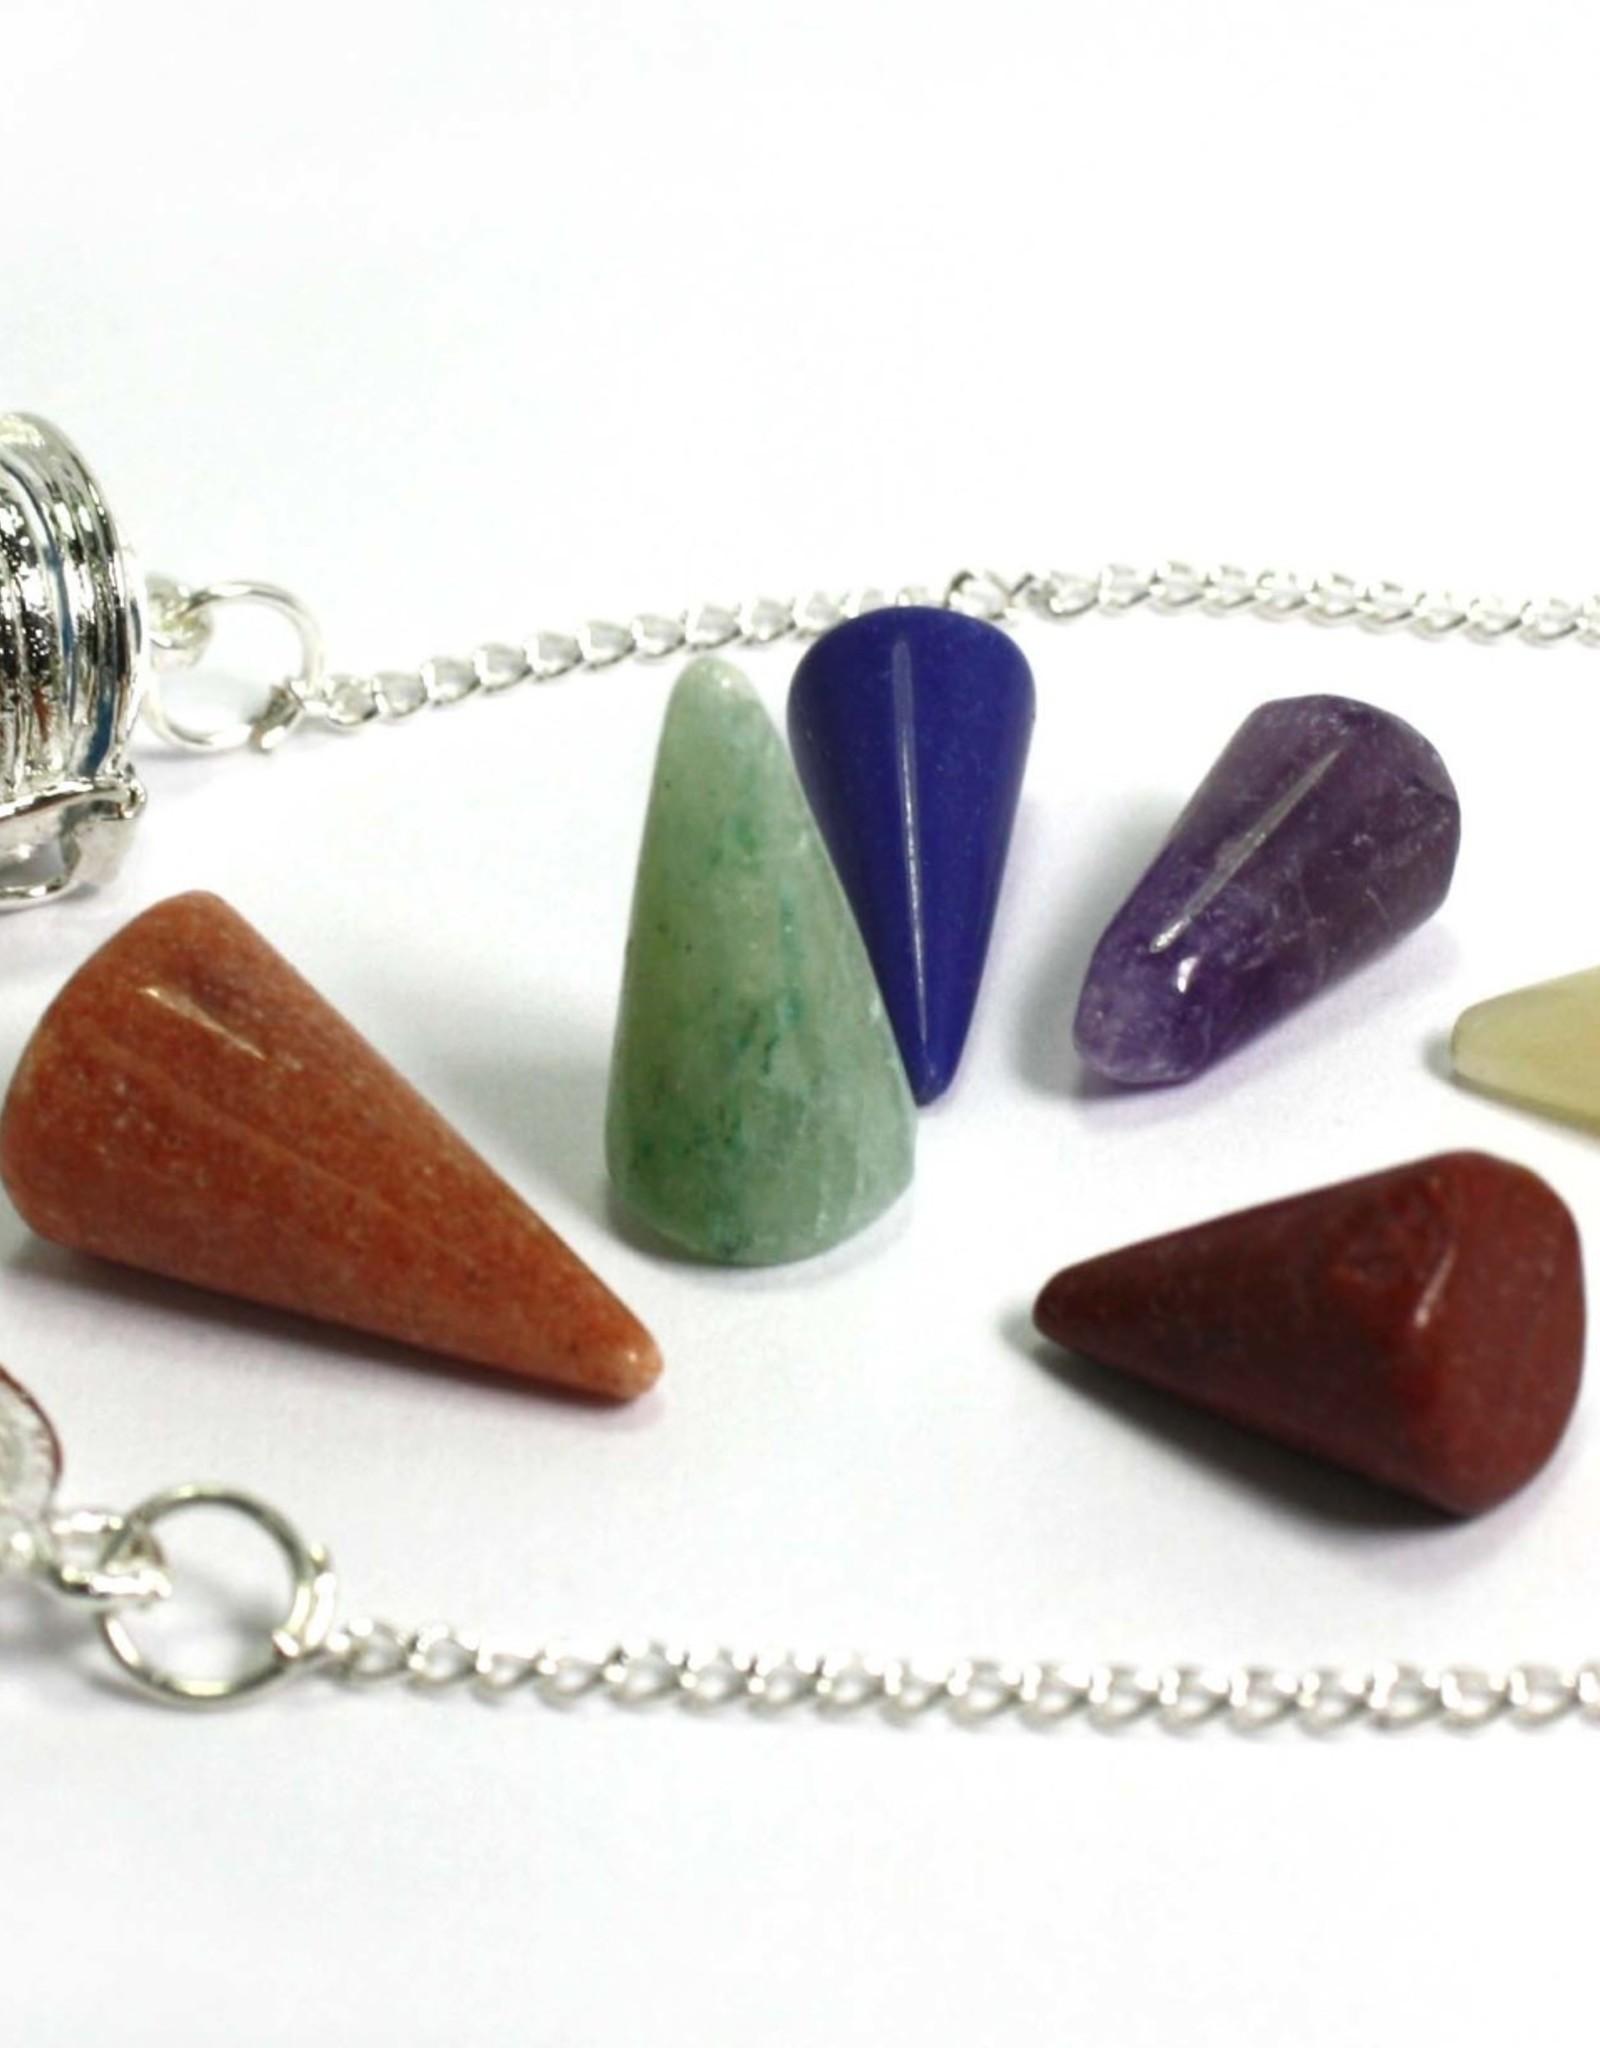 Chakra Pendulum w/ 7 Stones